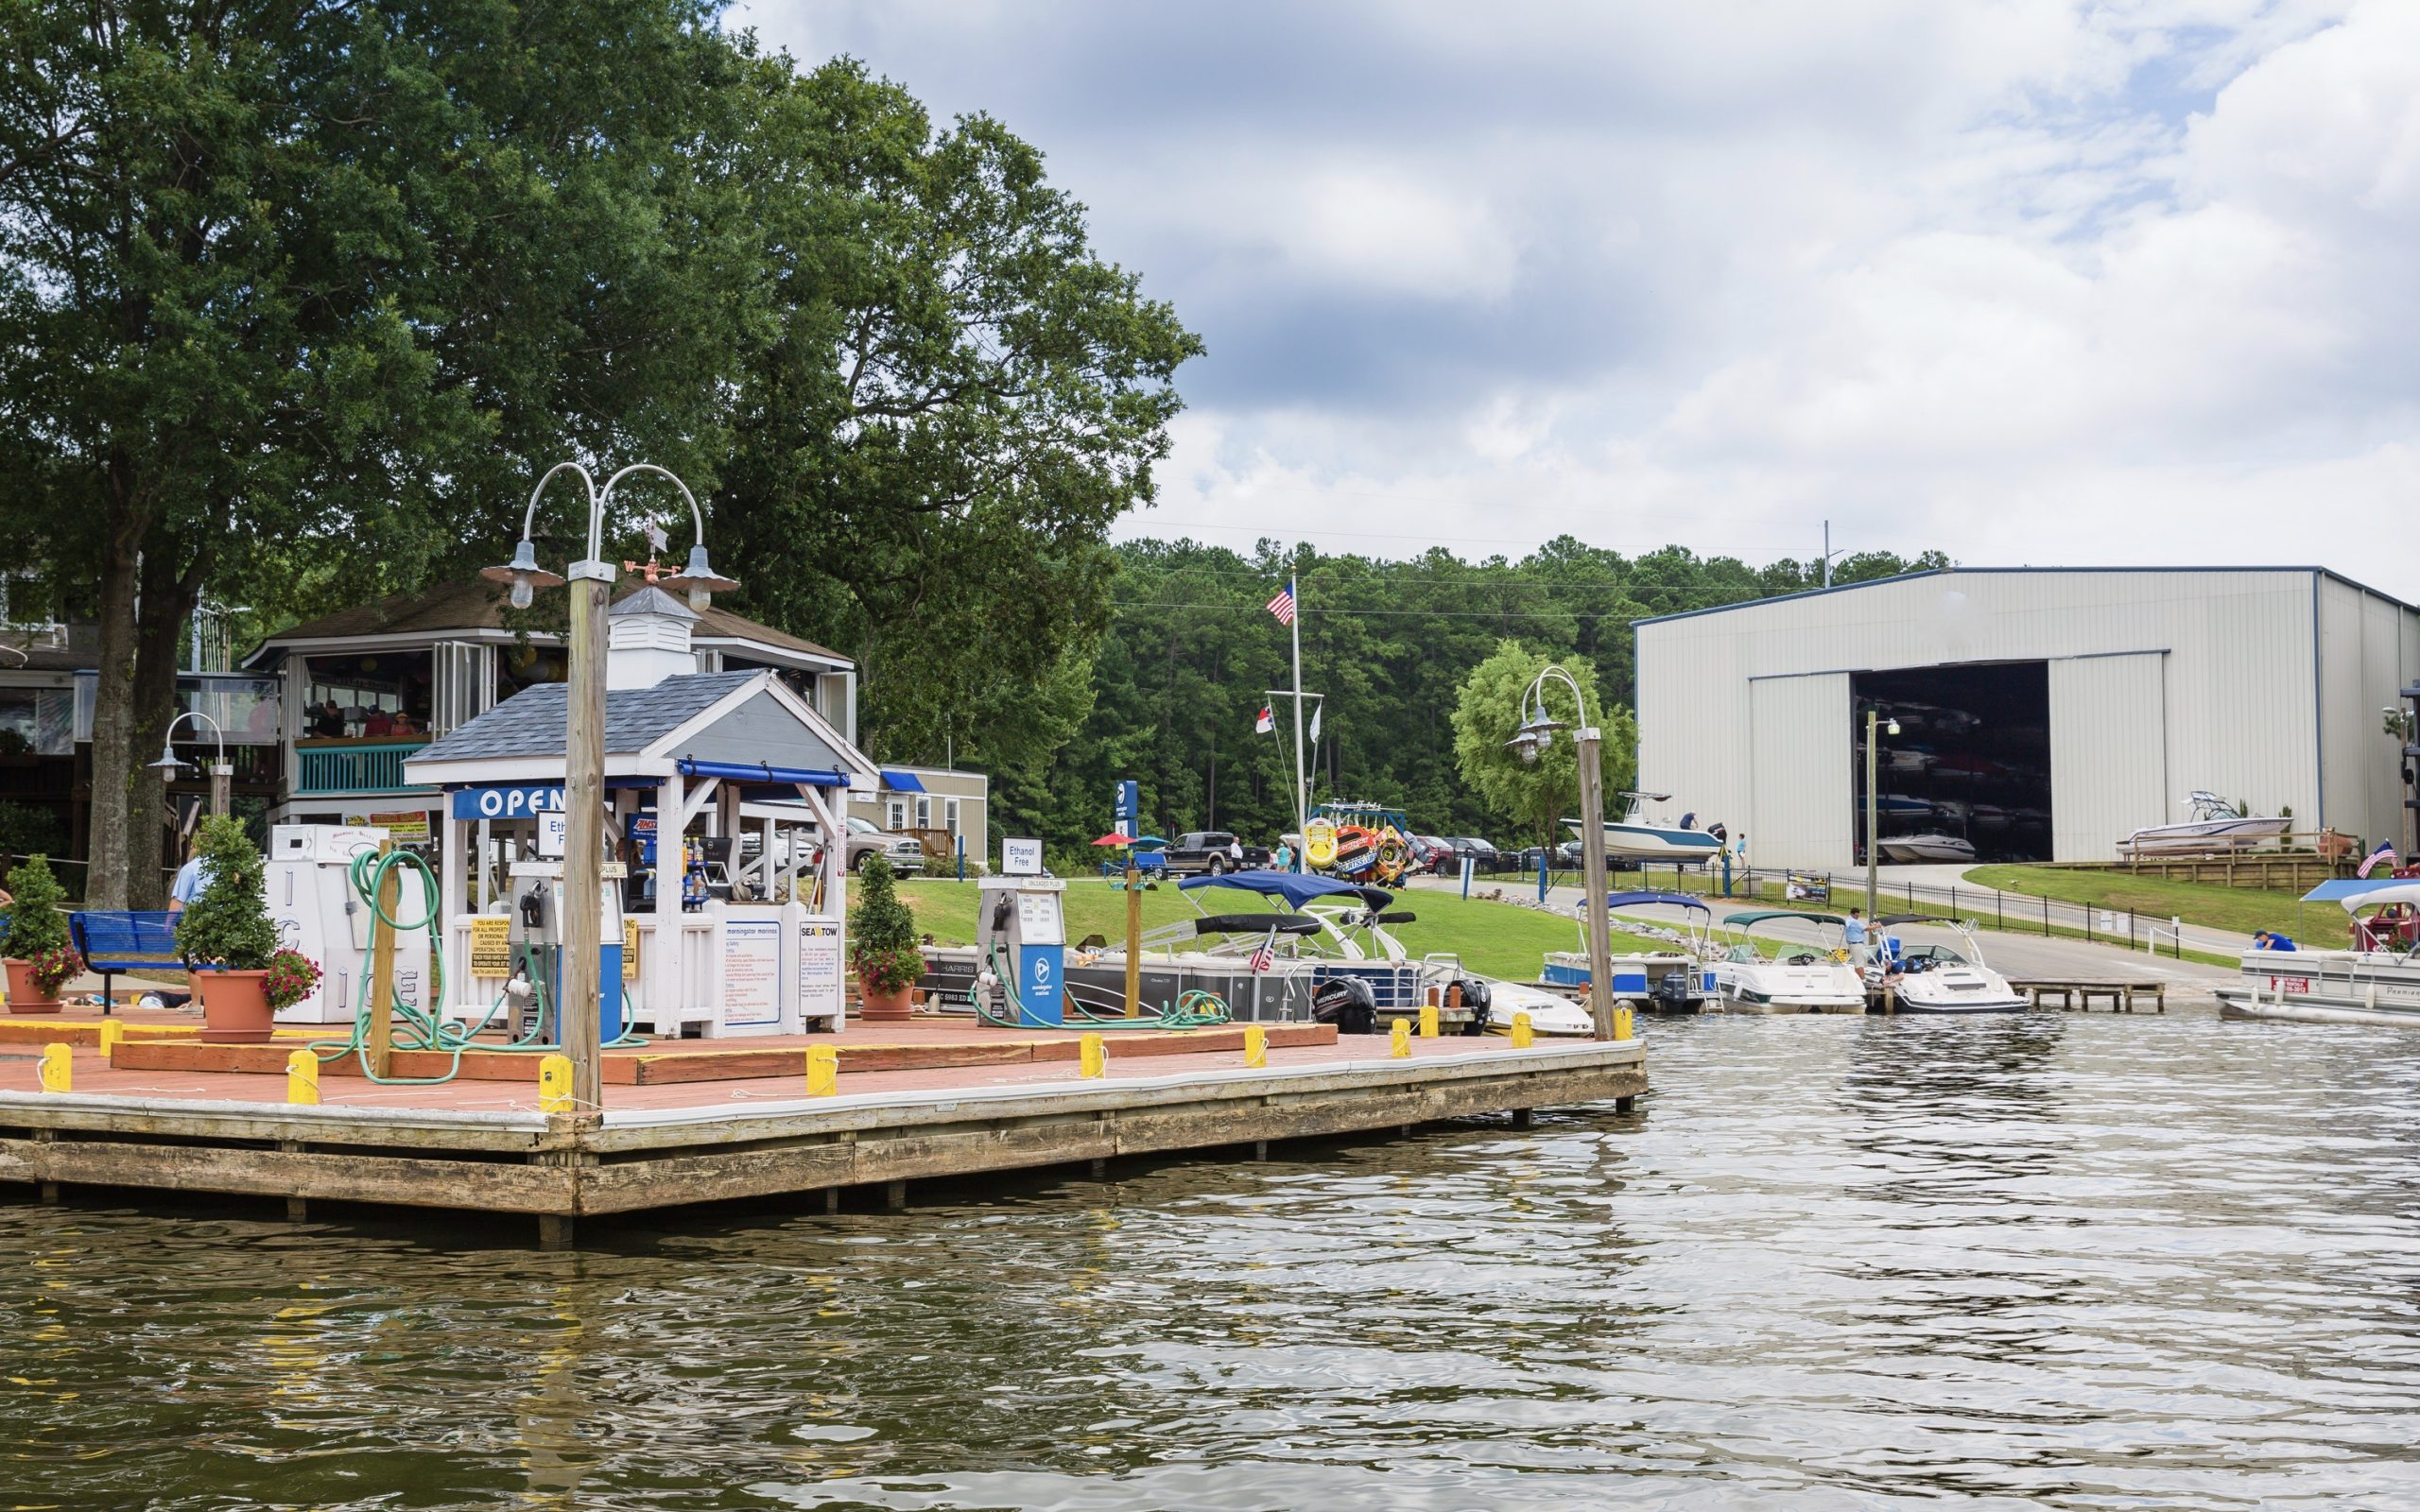 Eaton Ferry Marina fuel dock and boat docks at Lake Gaston